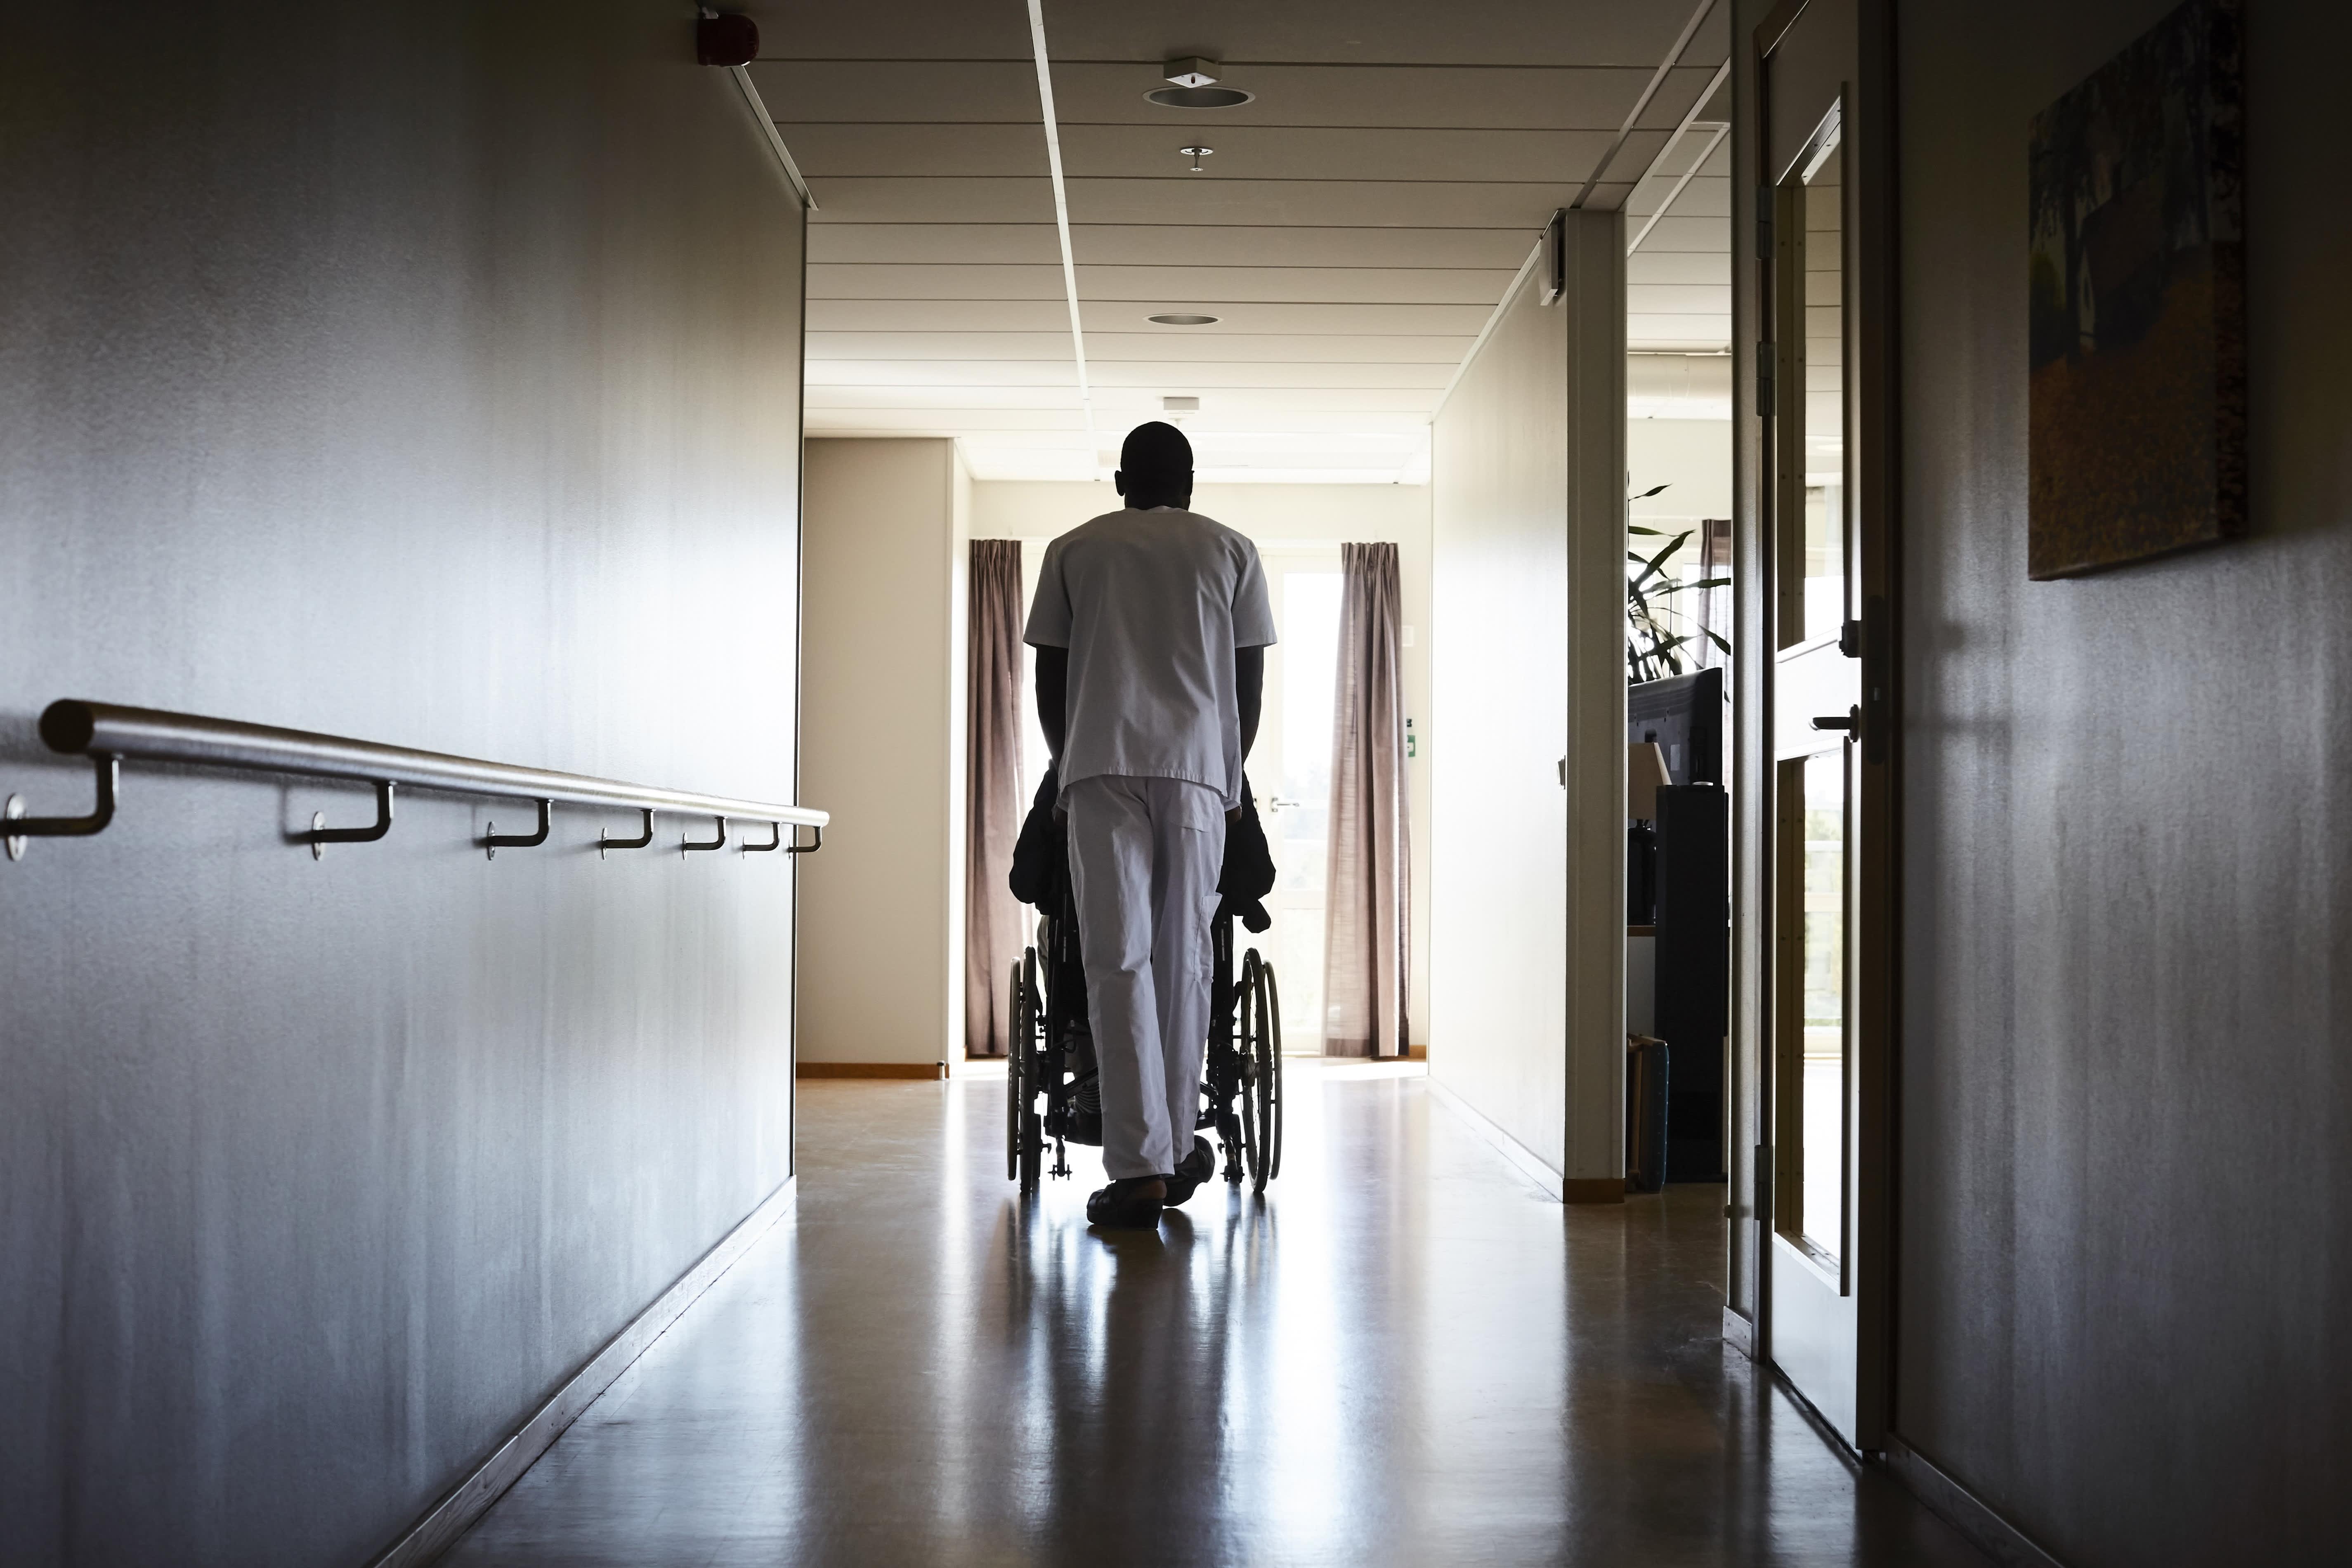 Sweden boosts elderly care spending as coronavirus death toll rises